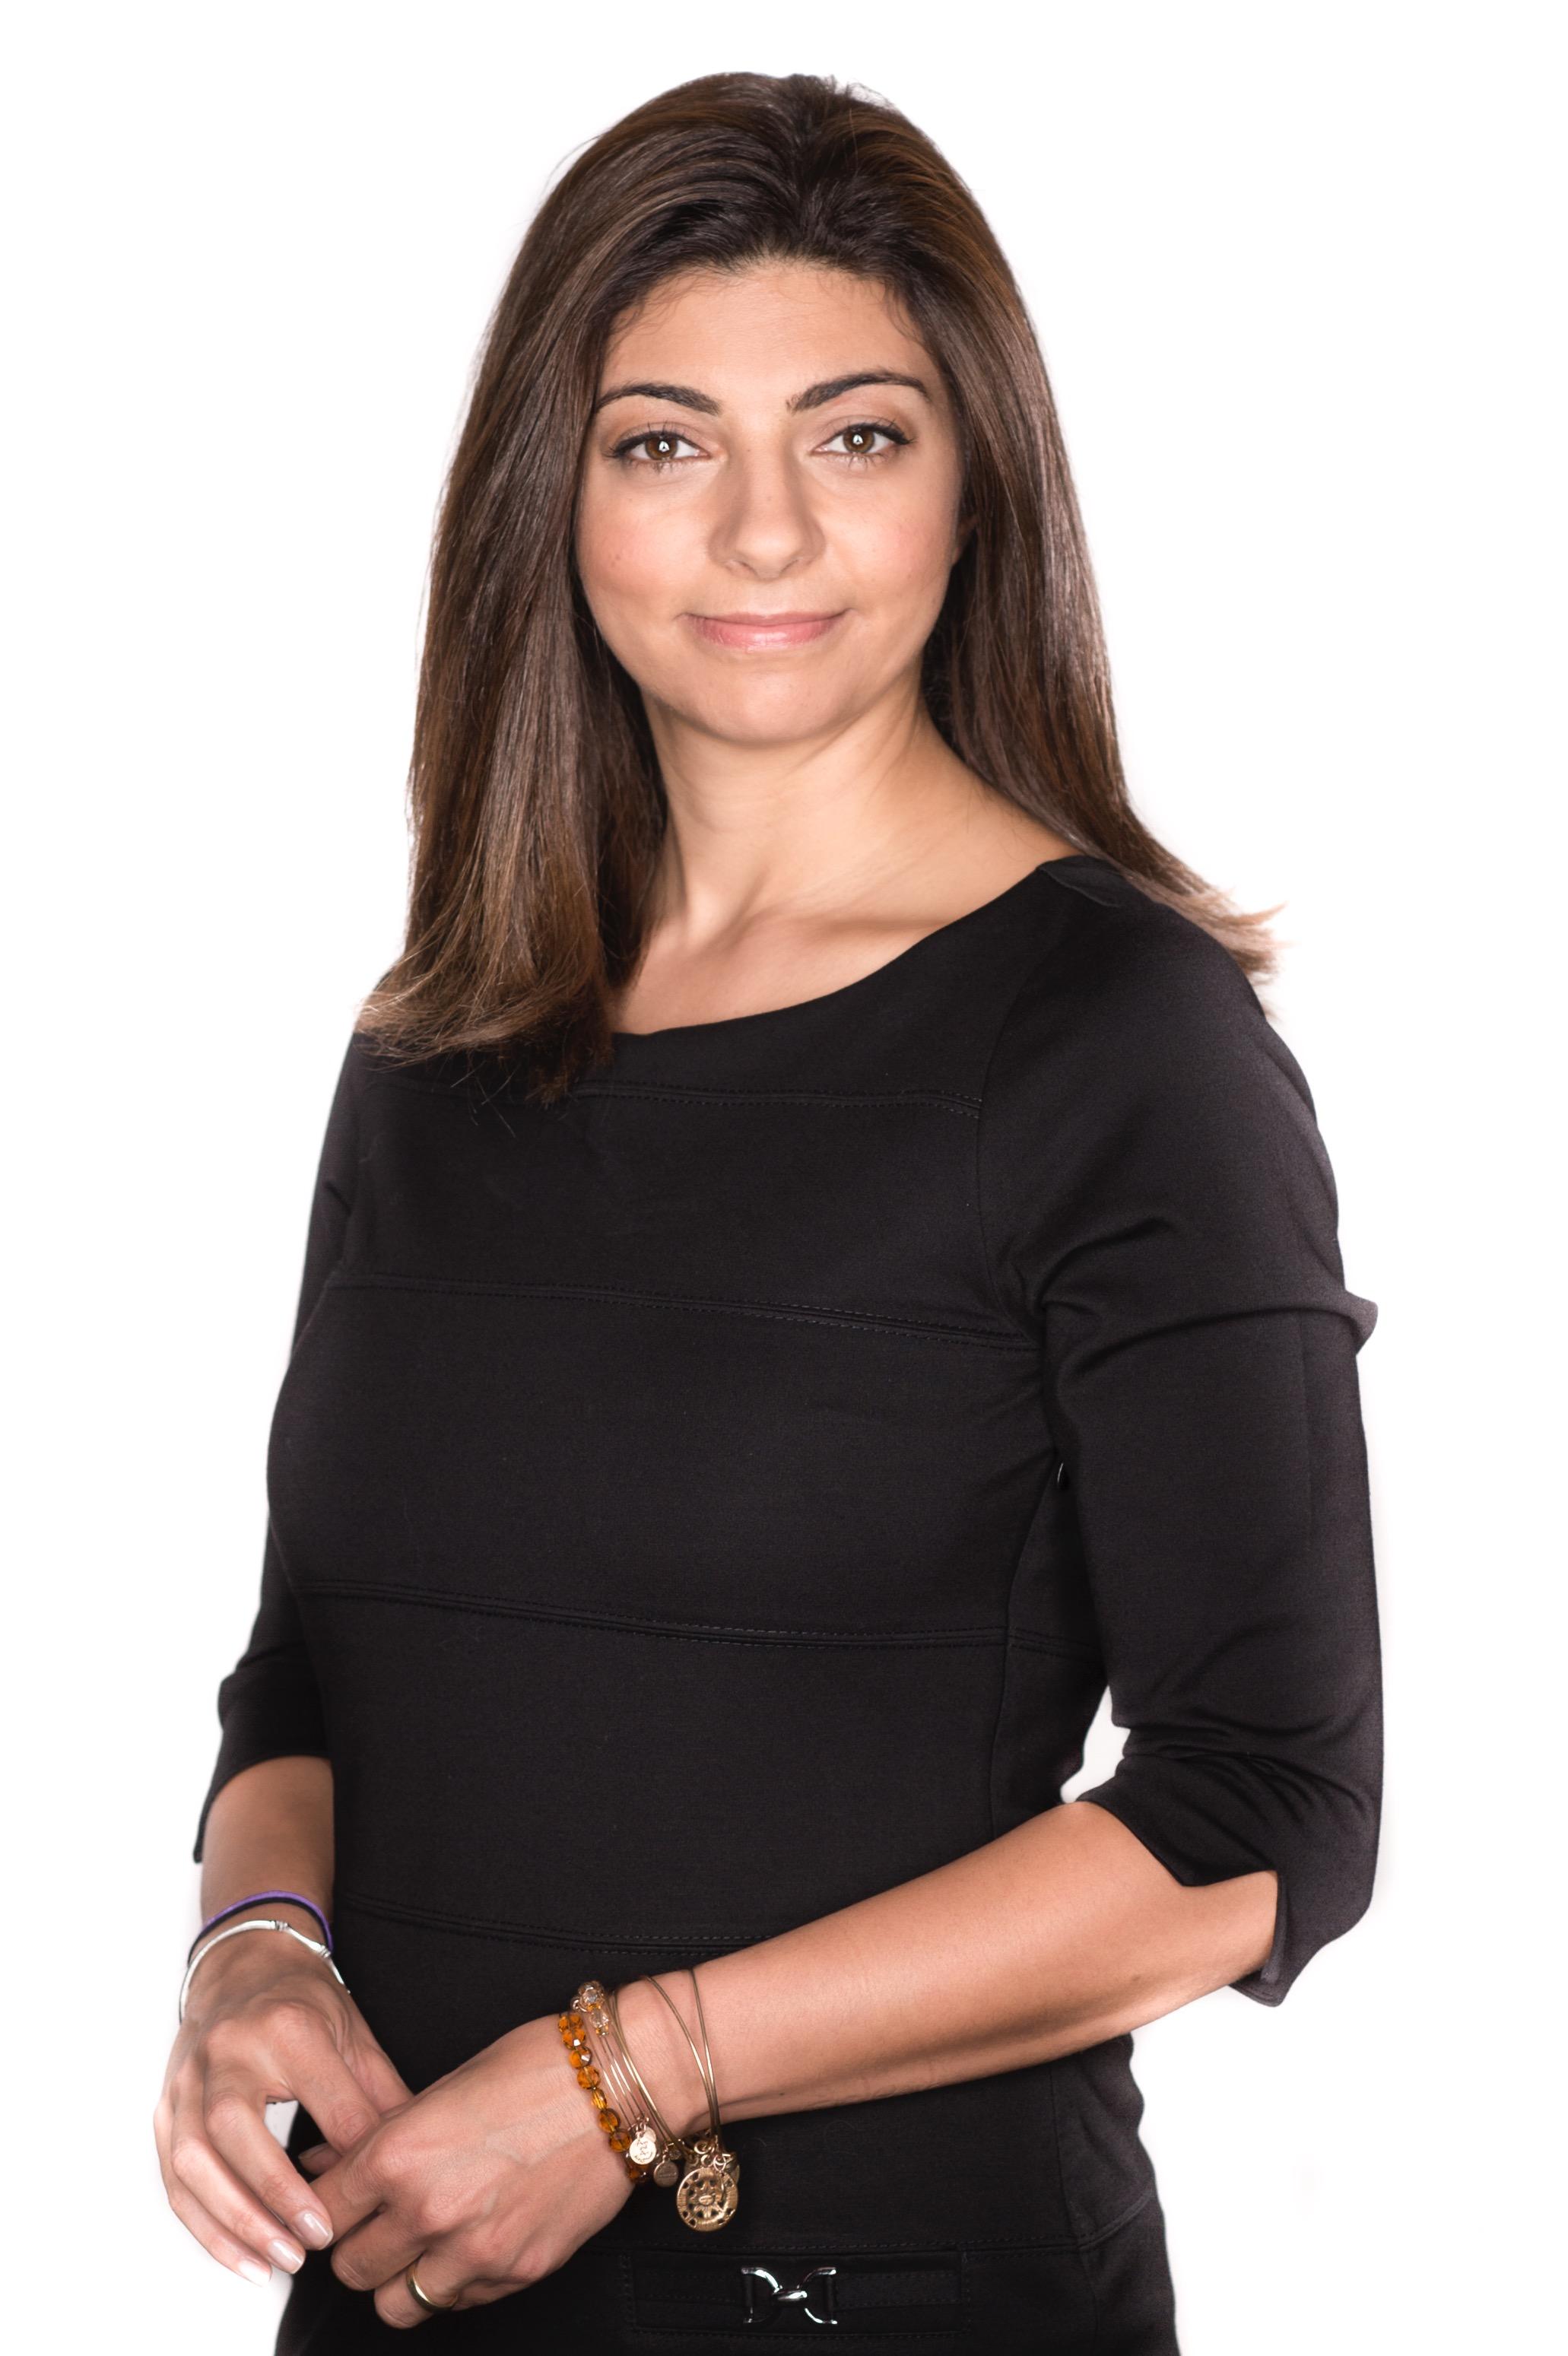 Rana el Kaliouby headshot